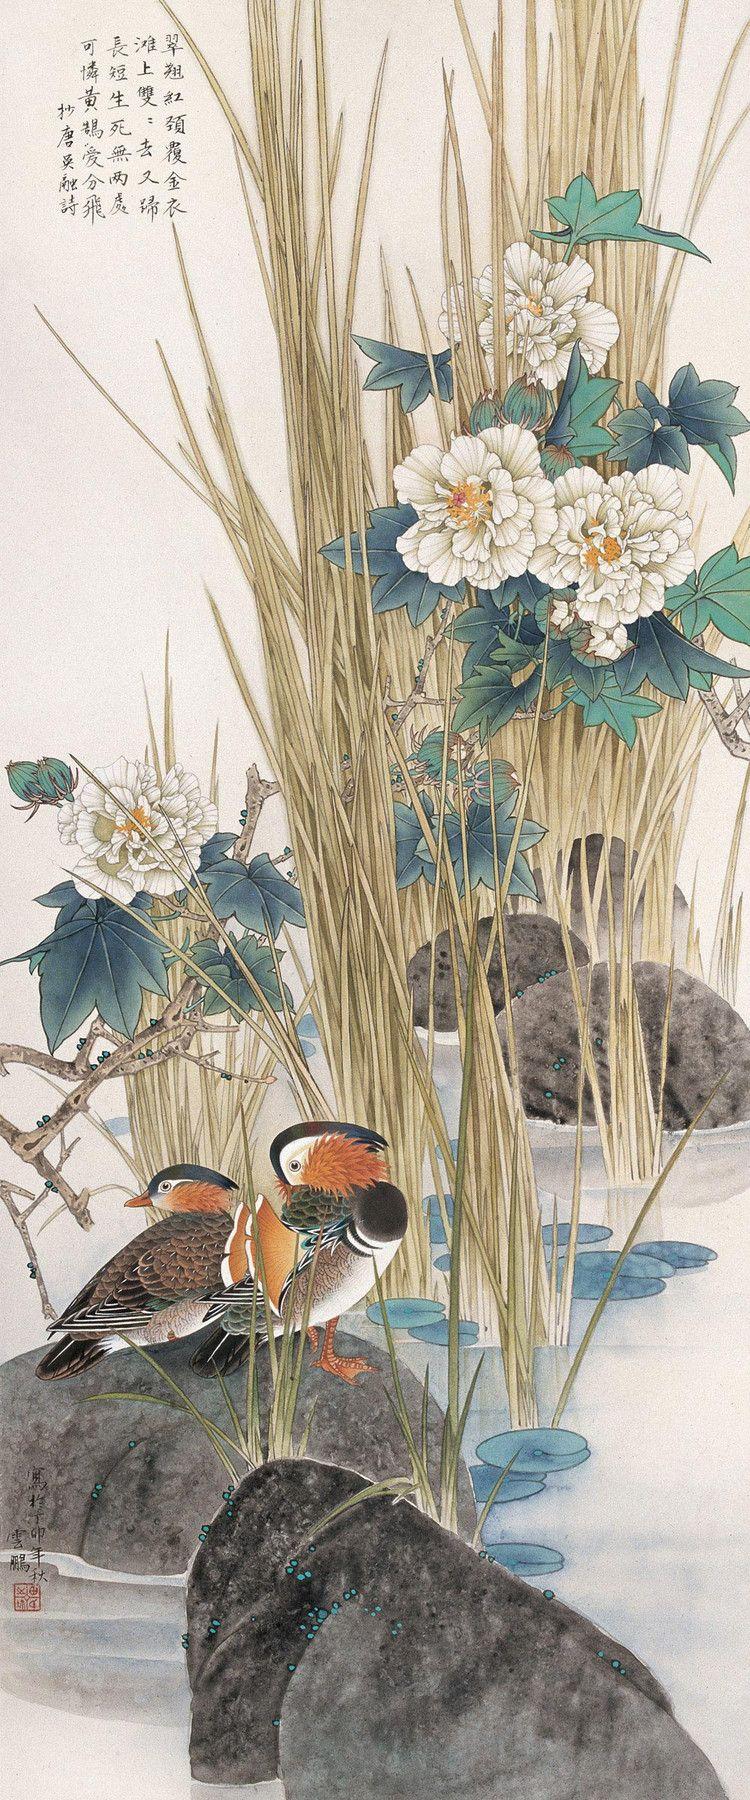 Chinese fine brush painting by Tian Yunpeng (b.1946) 田云鹏绘画作品欣赏